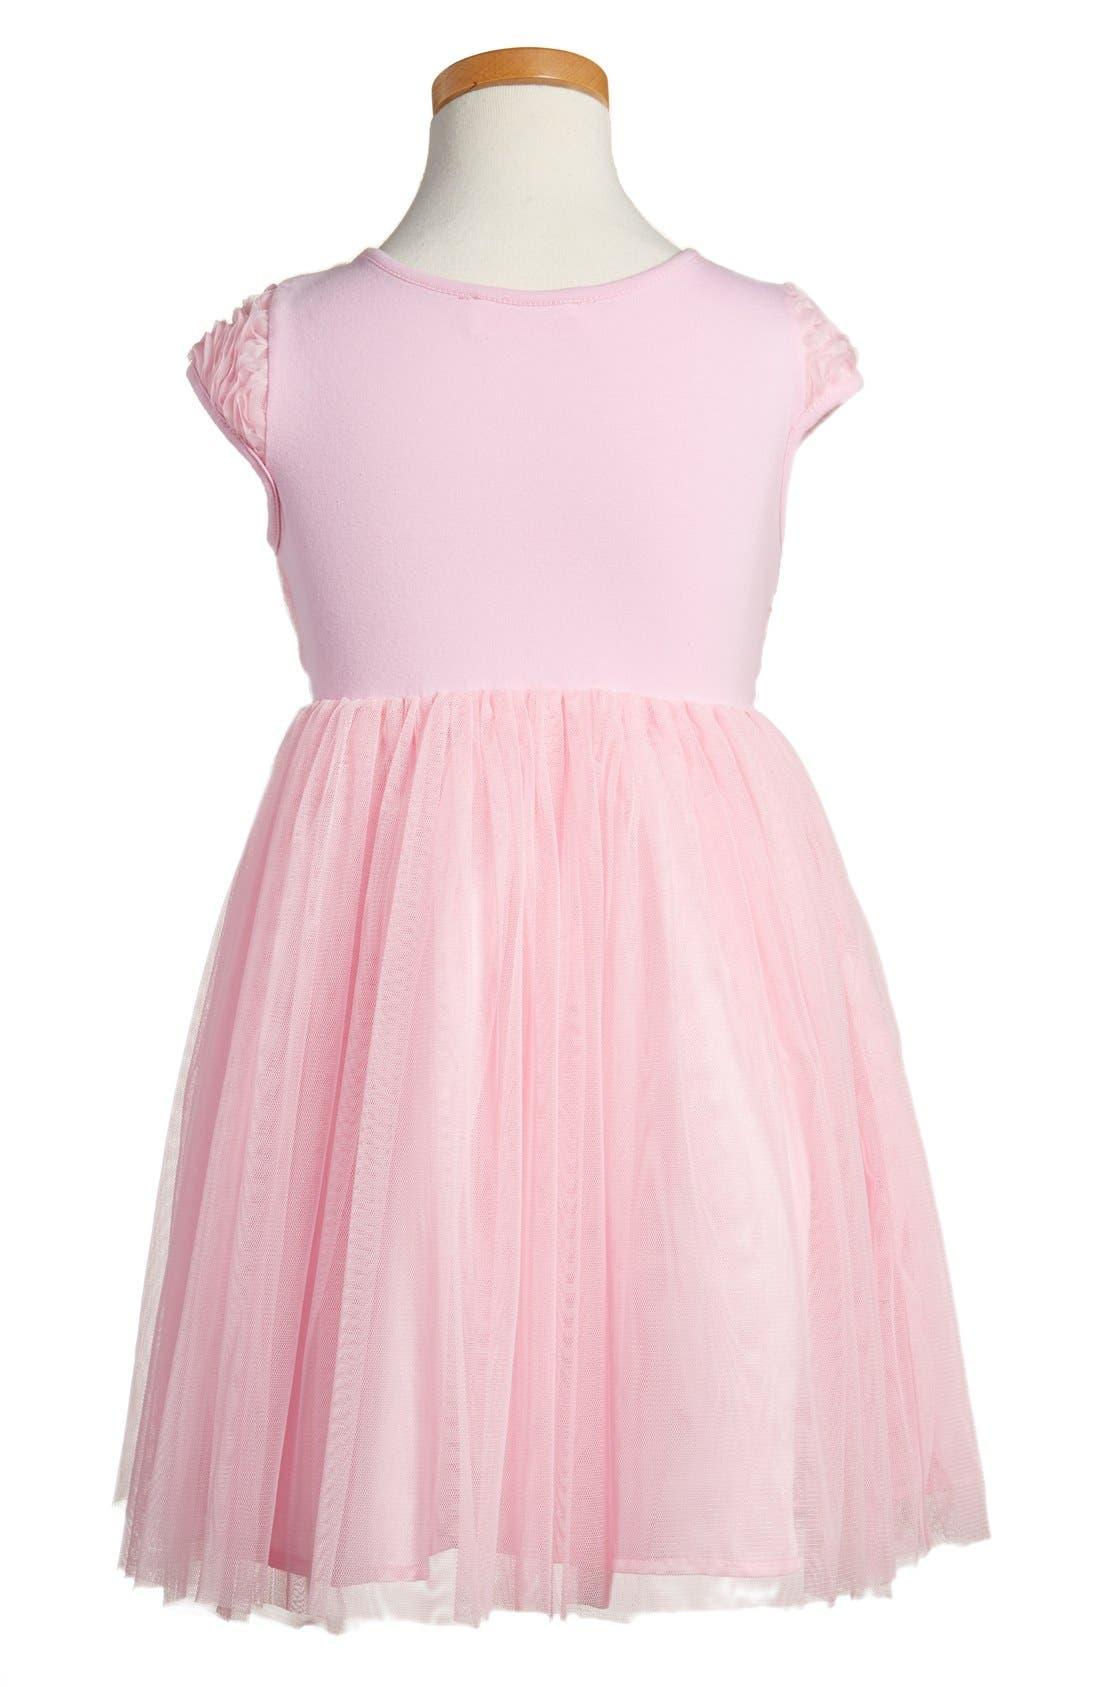 Ribbon Rosette Tulle Dress,                             Alternate thumbnail 2, color,                             PINK